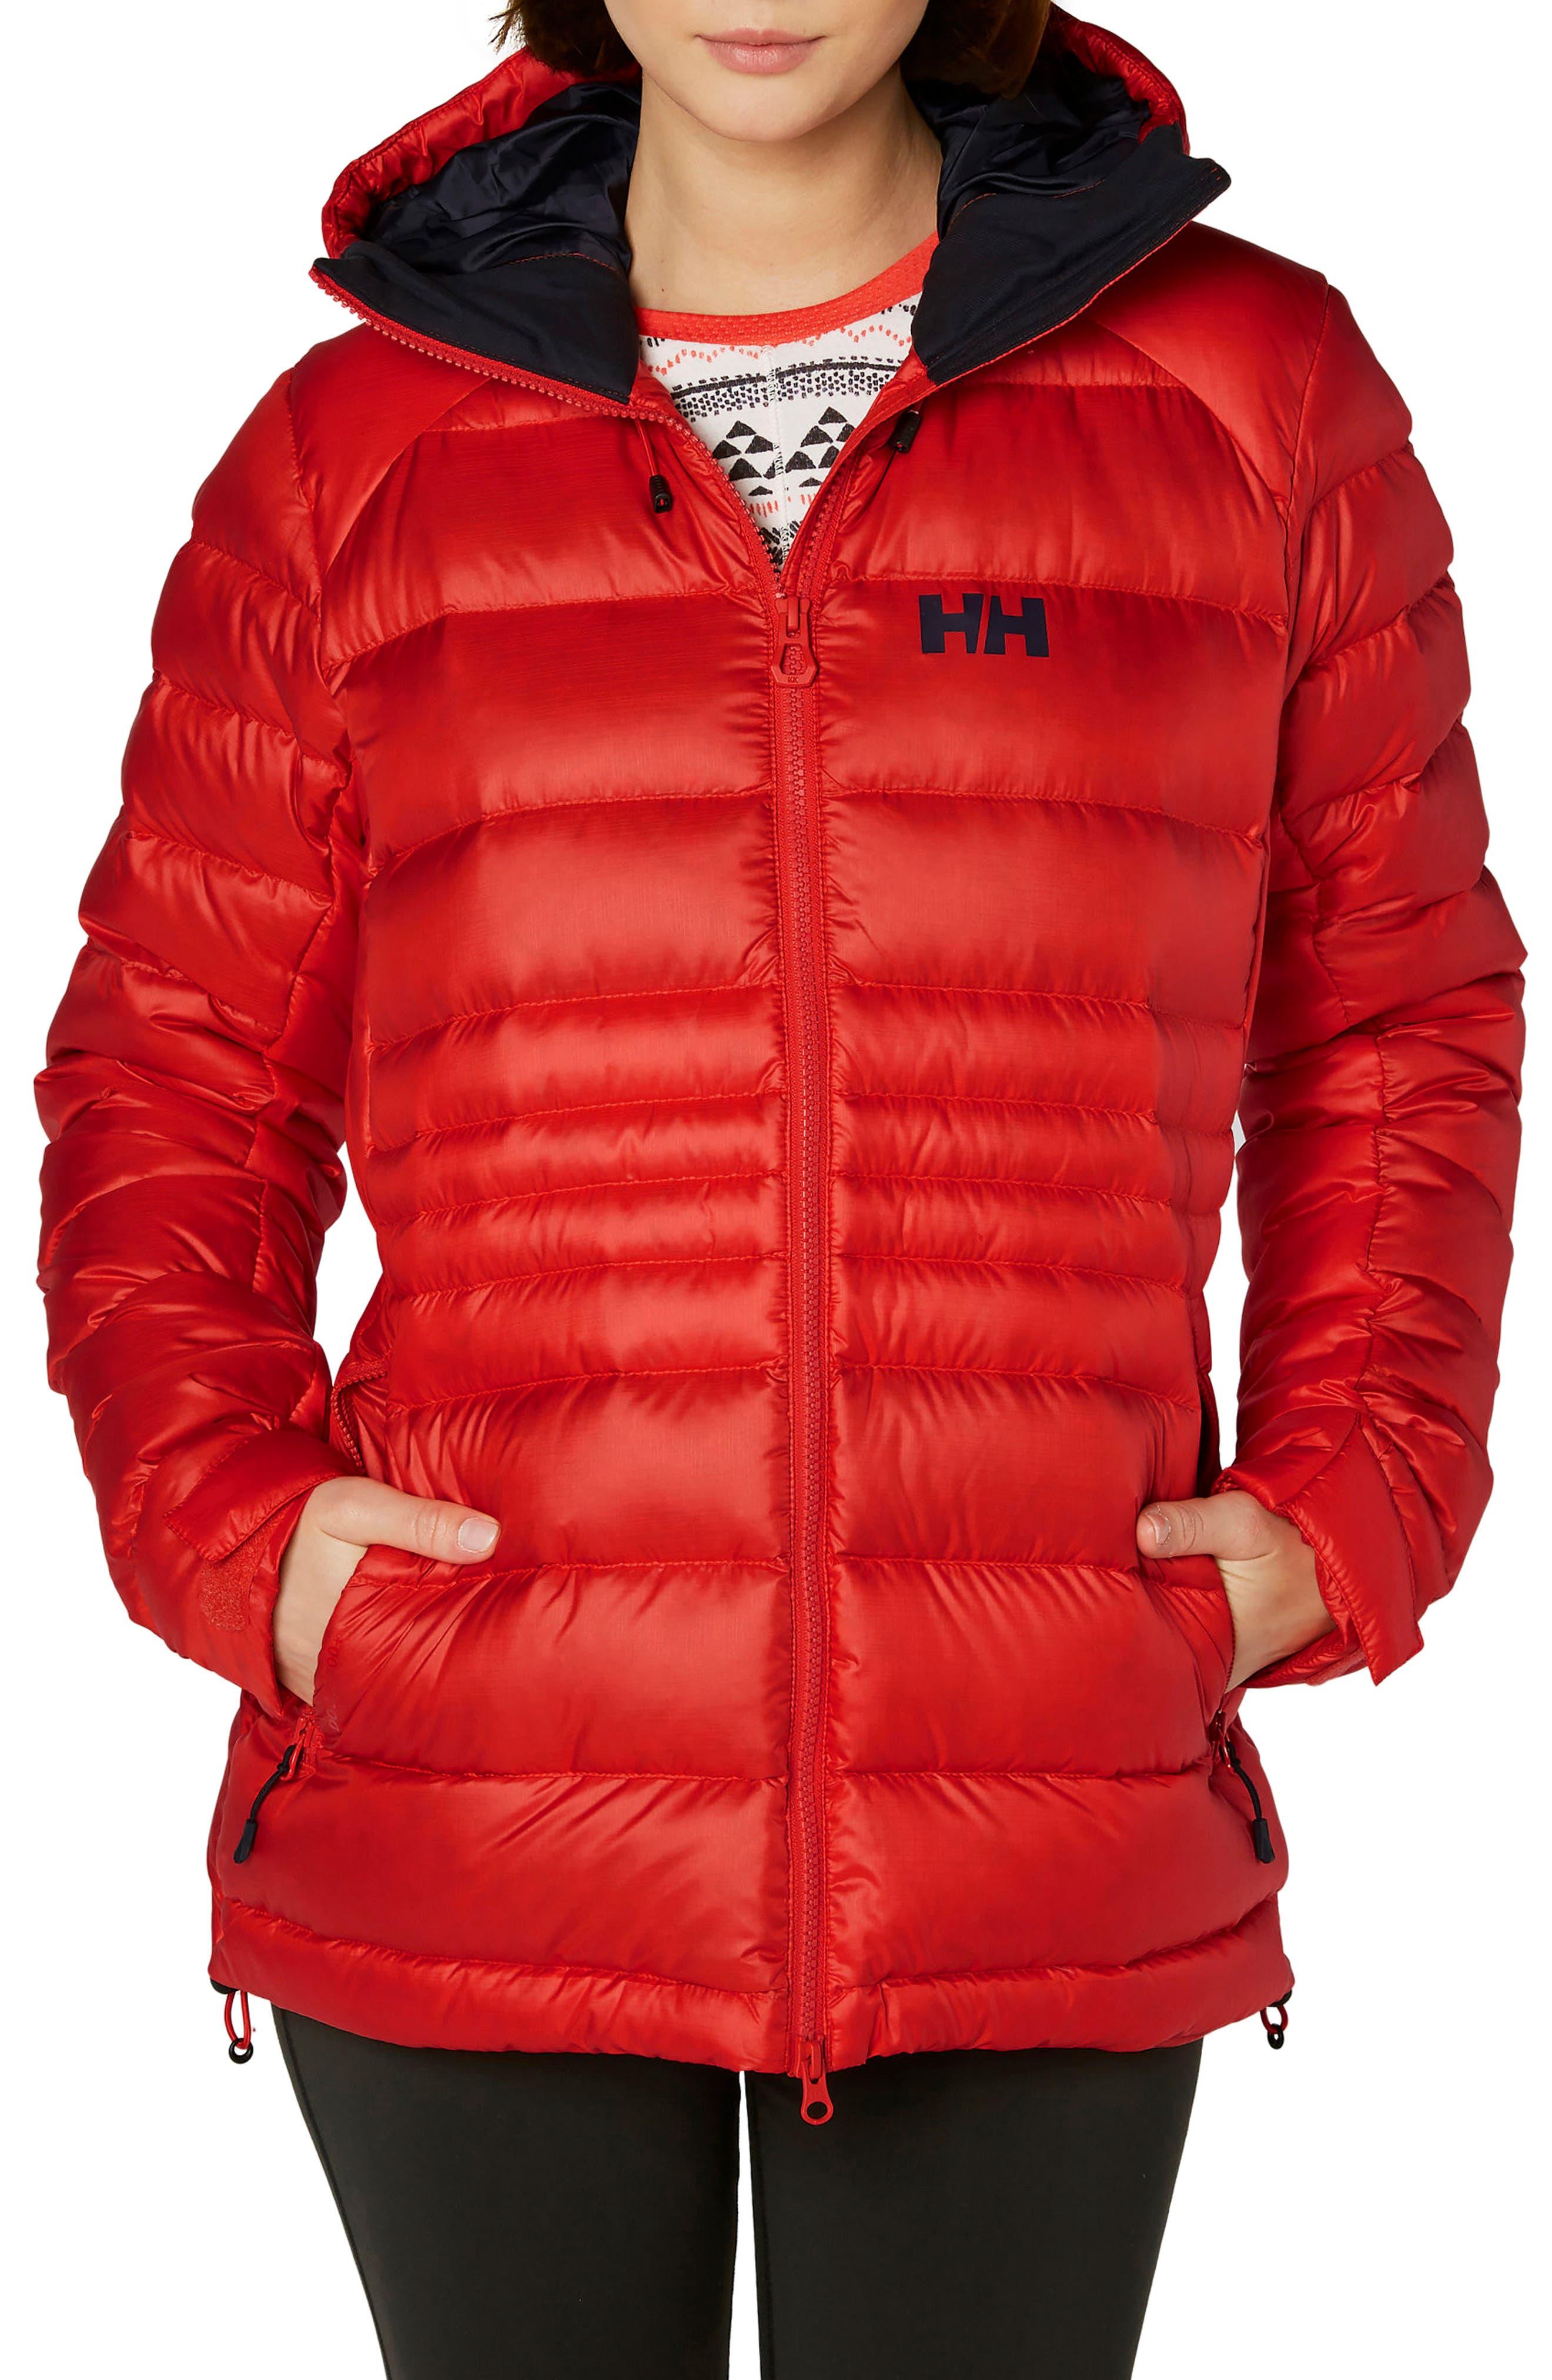 Vanir Icefall Down Jacket,                             Main thumbnail 1, color,                             106 Melt Down